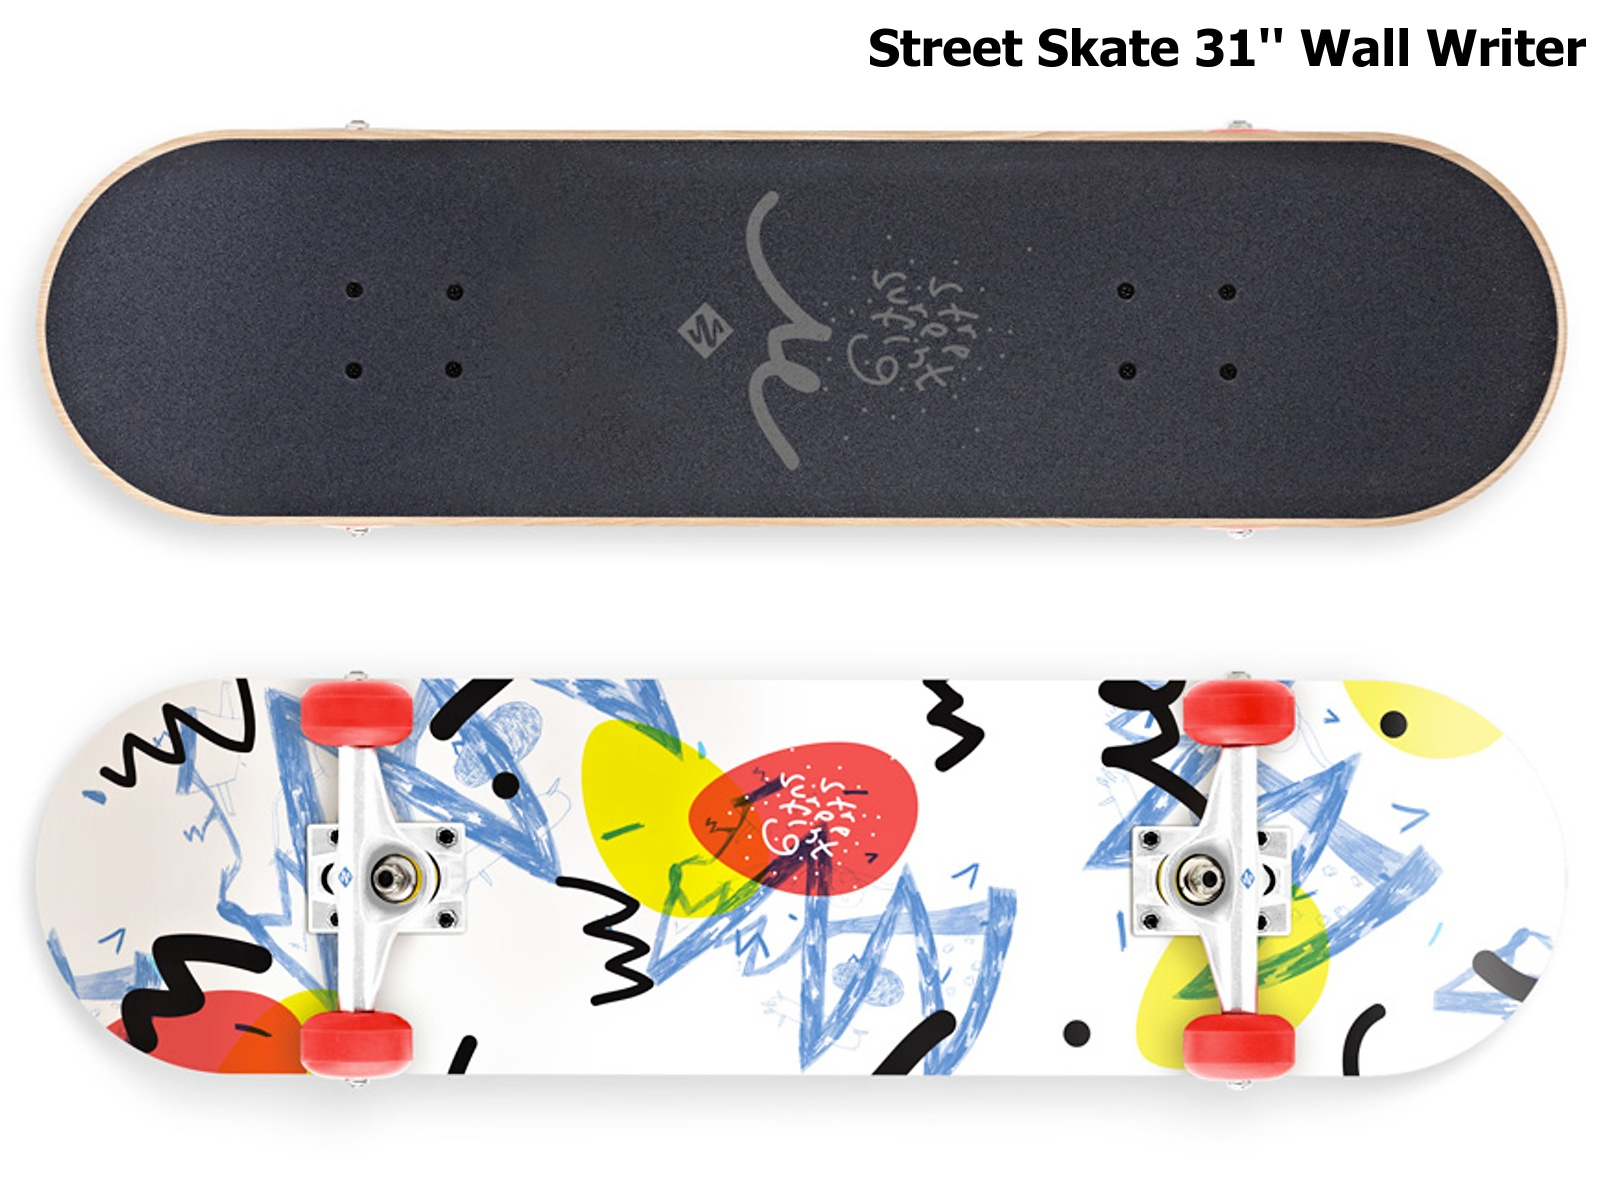 Street Surfing Wall Writer